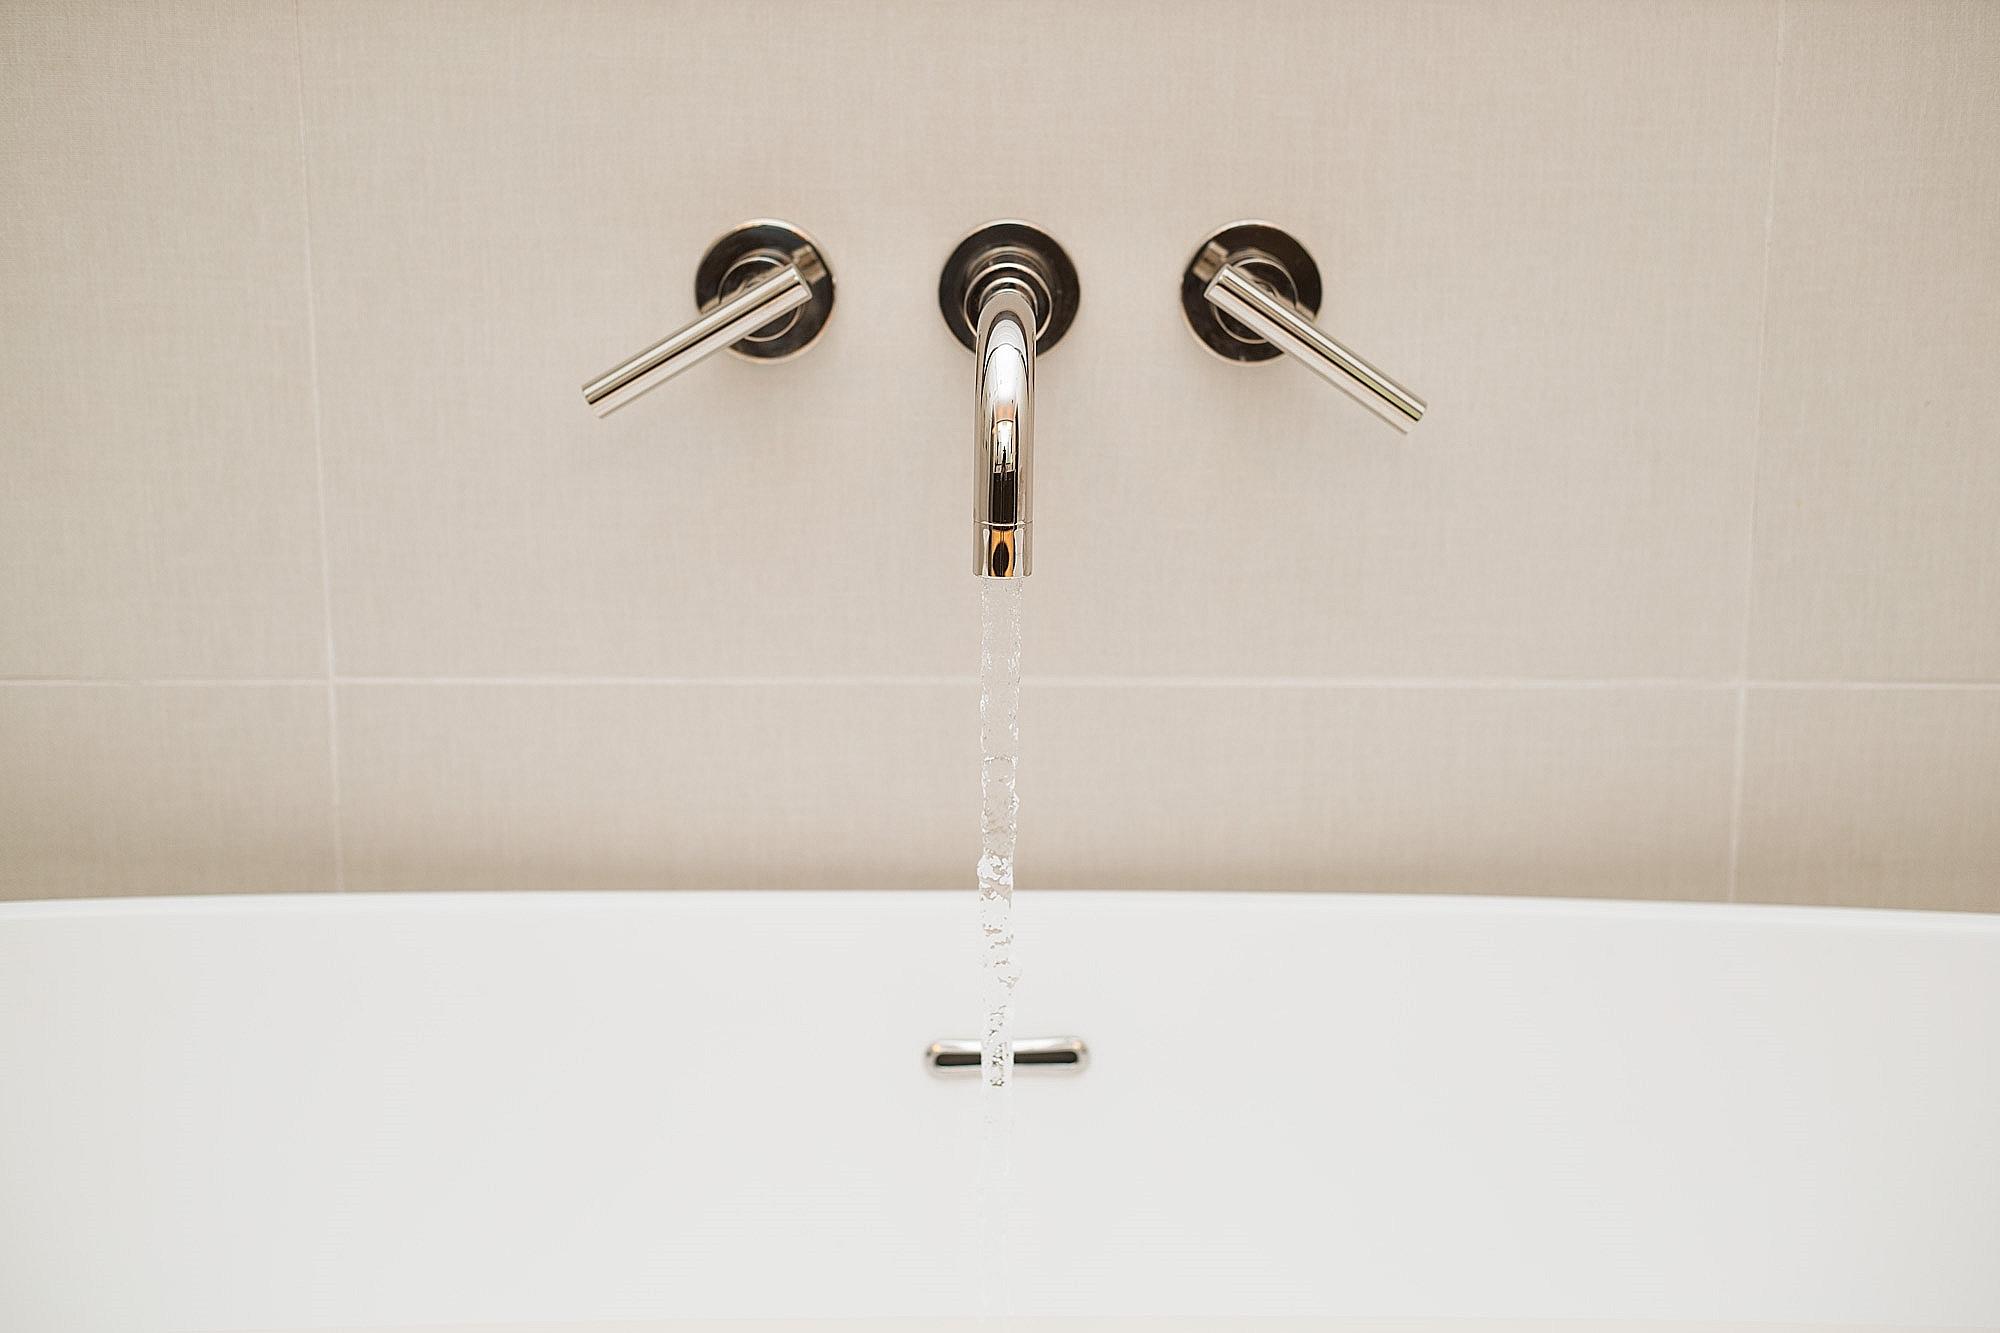 Master bathroom remodel with modern wall mount tub filler | Interior Designer: Carla Aston / Photographer: Tori Aston #bathroomideas #bathroomremodel #tubfiller